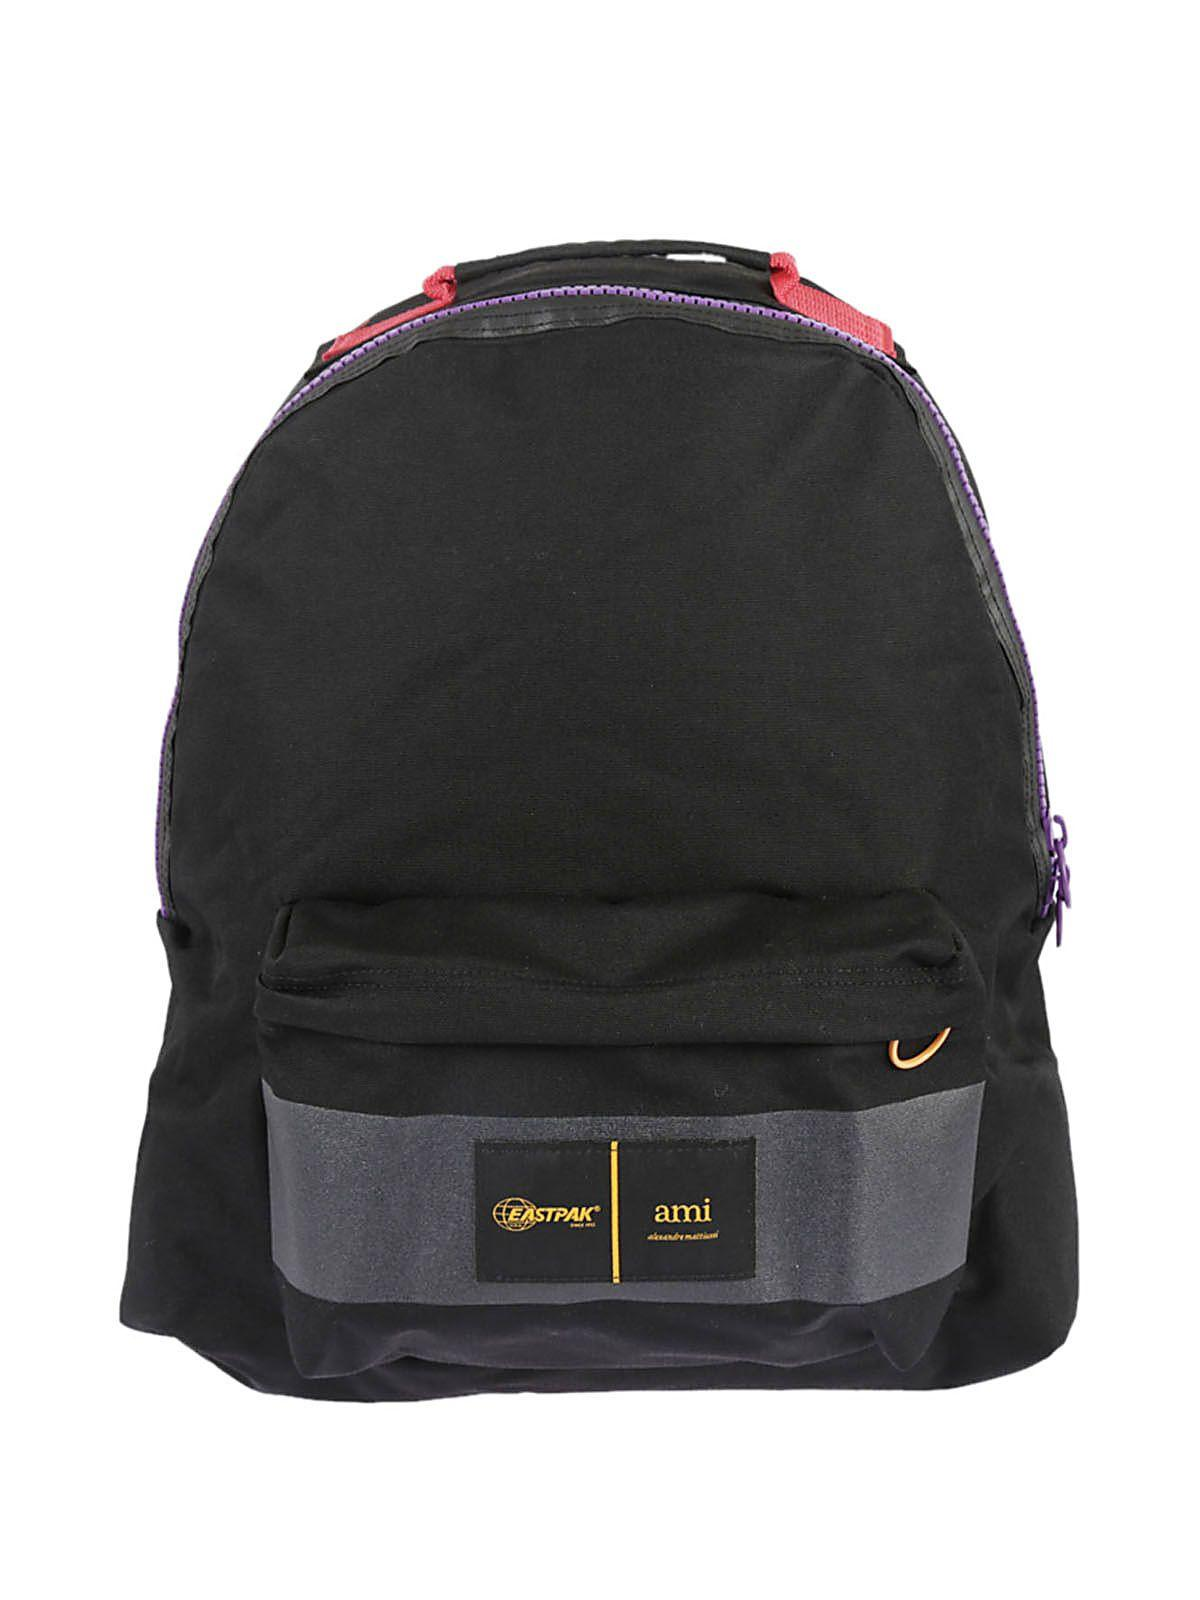 Ami Alexandre Mattiussi Ami X Eastpak Backpack In Multicolor